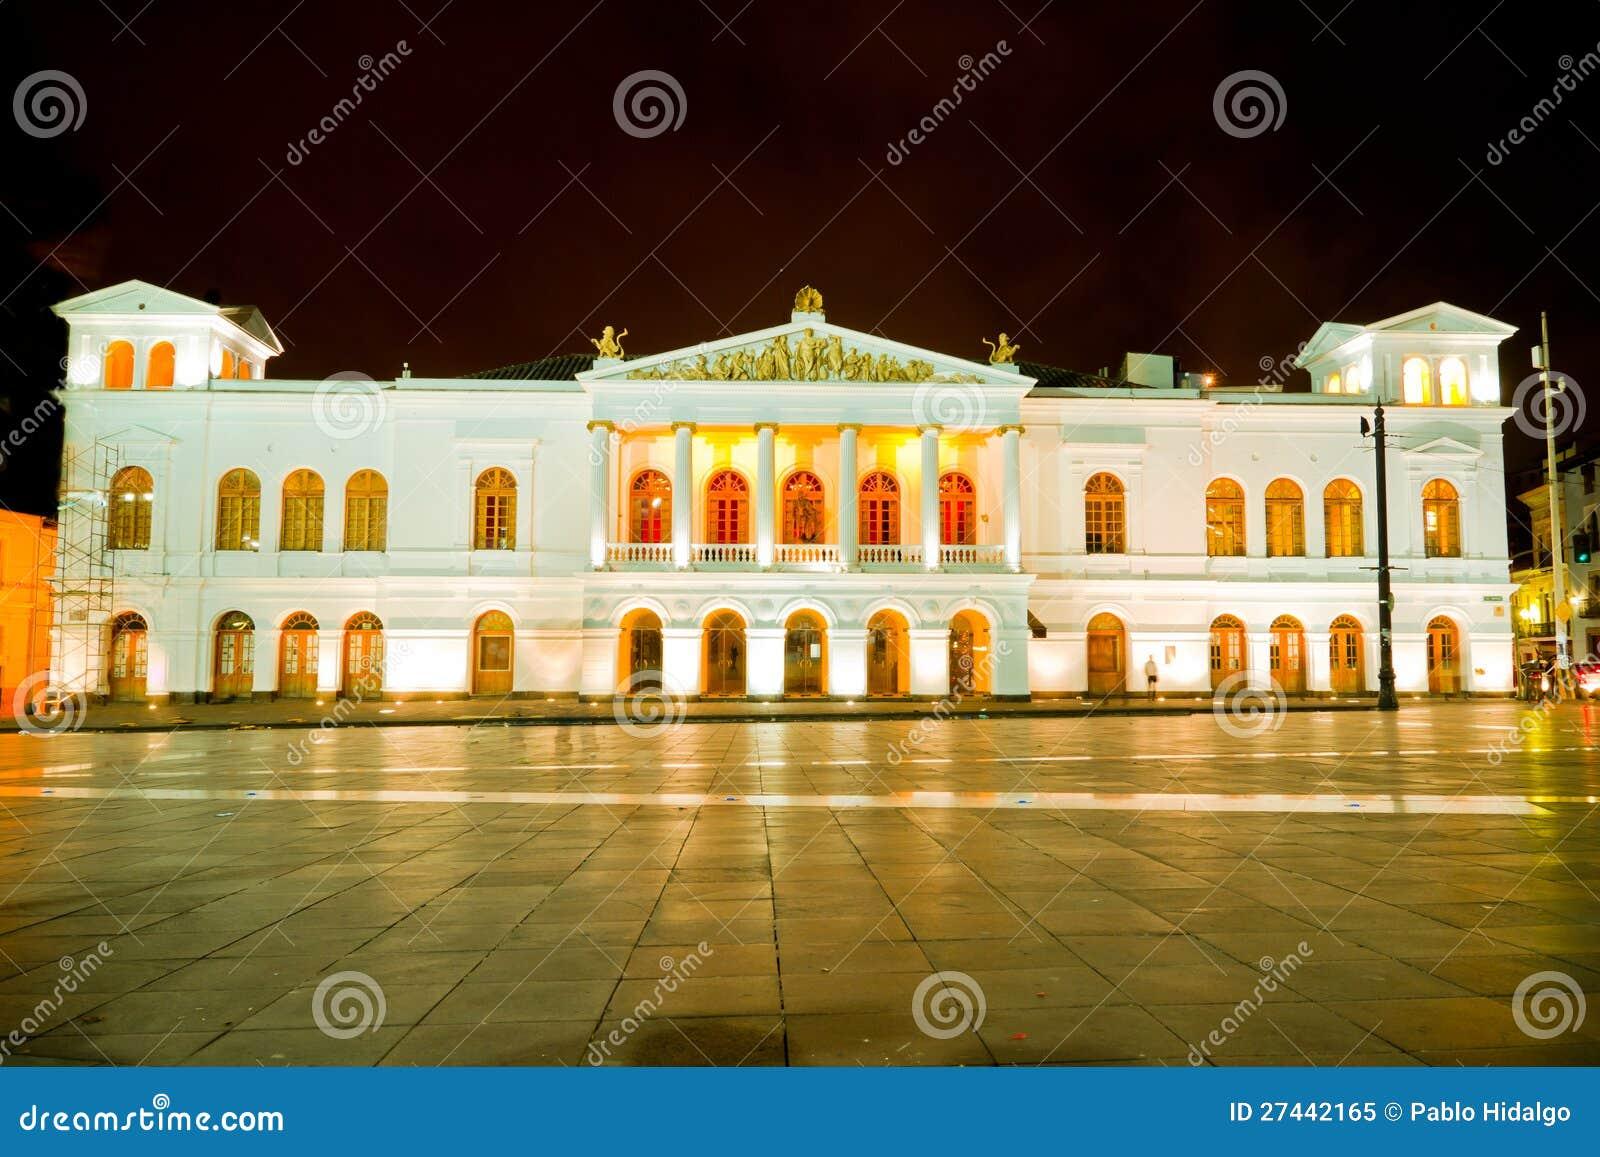 Sucre Theather Historic Center Of Quito, Ecuador. Stock